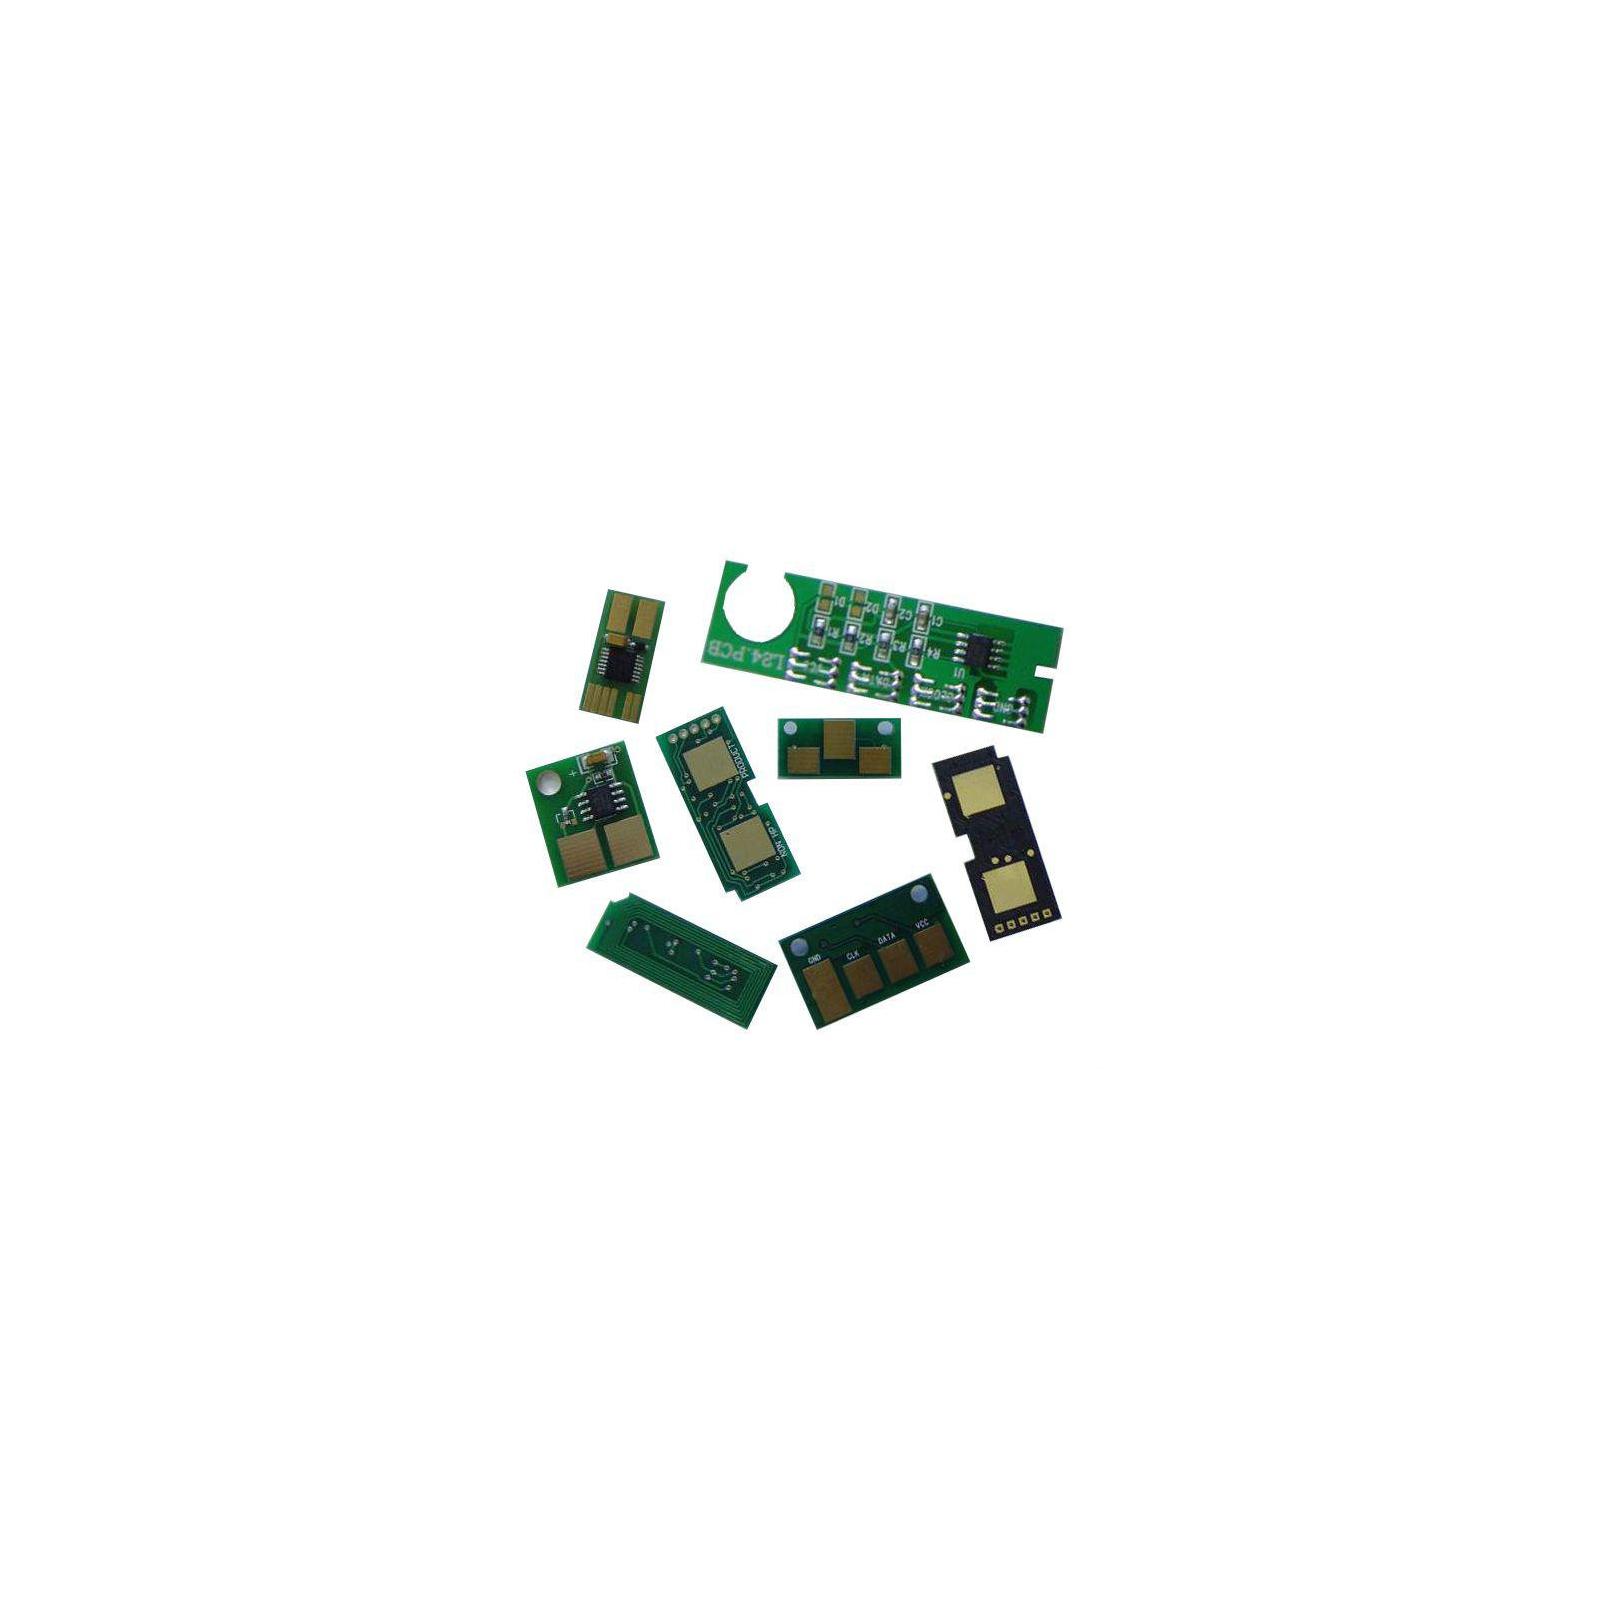 Чип для картриджа EPSON T1283 ДЛЯ S22/SX125 MAGENTA Apex (CHIP-EPS-T1283-M)